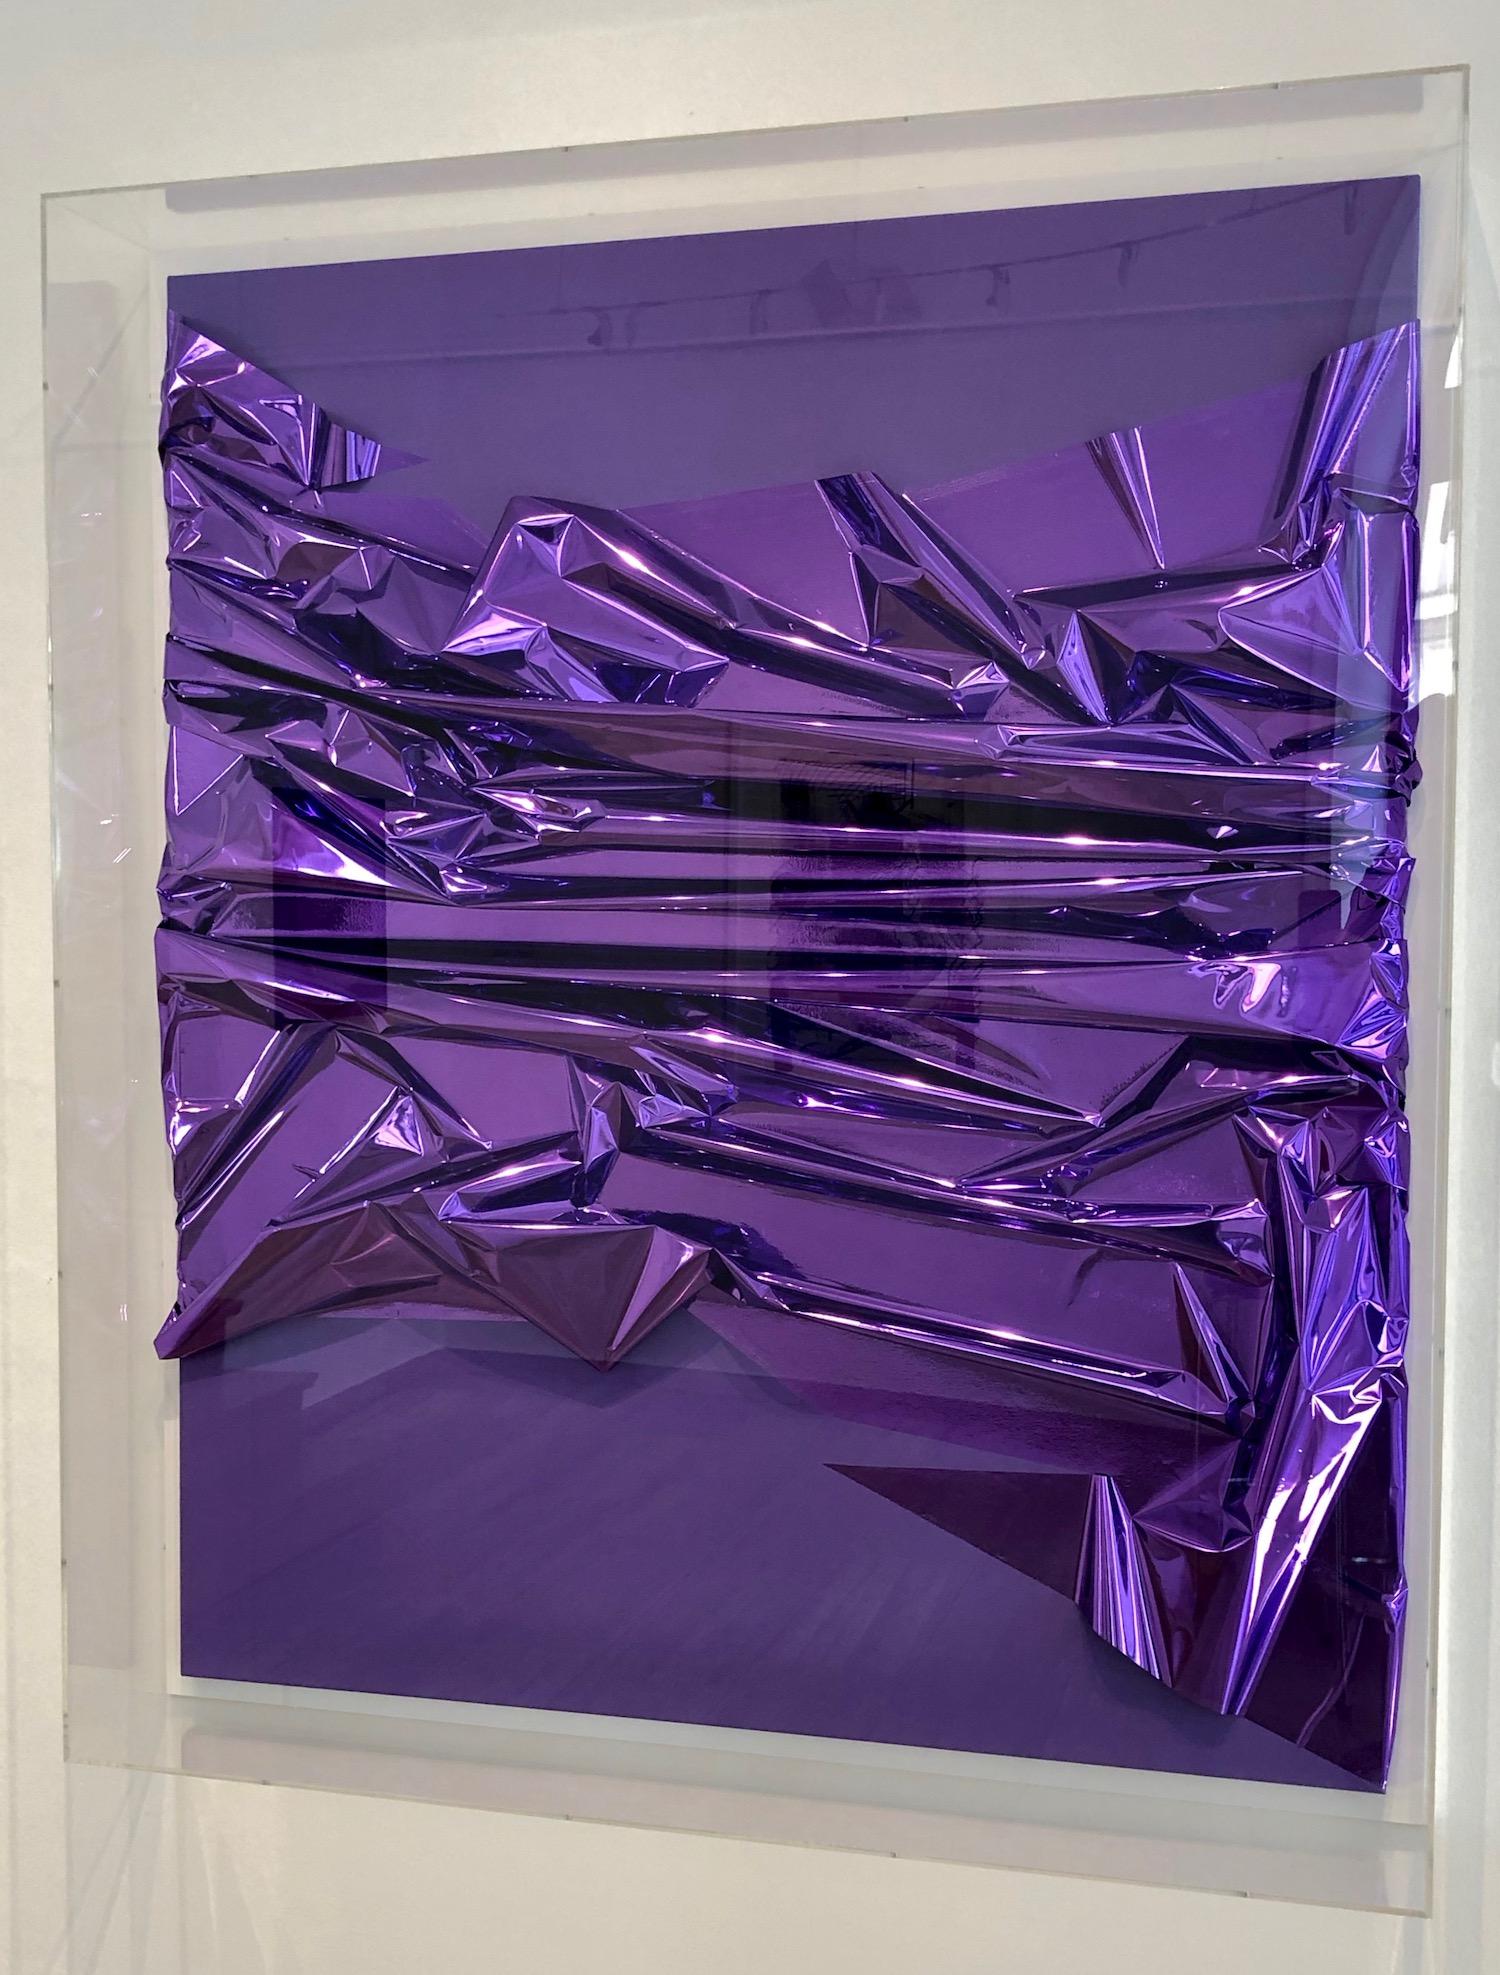 Anselm Reyle, untitled, 2007